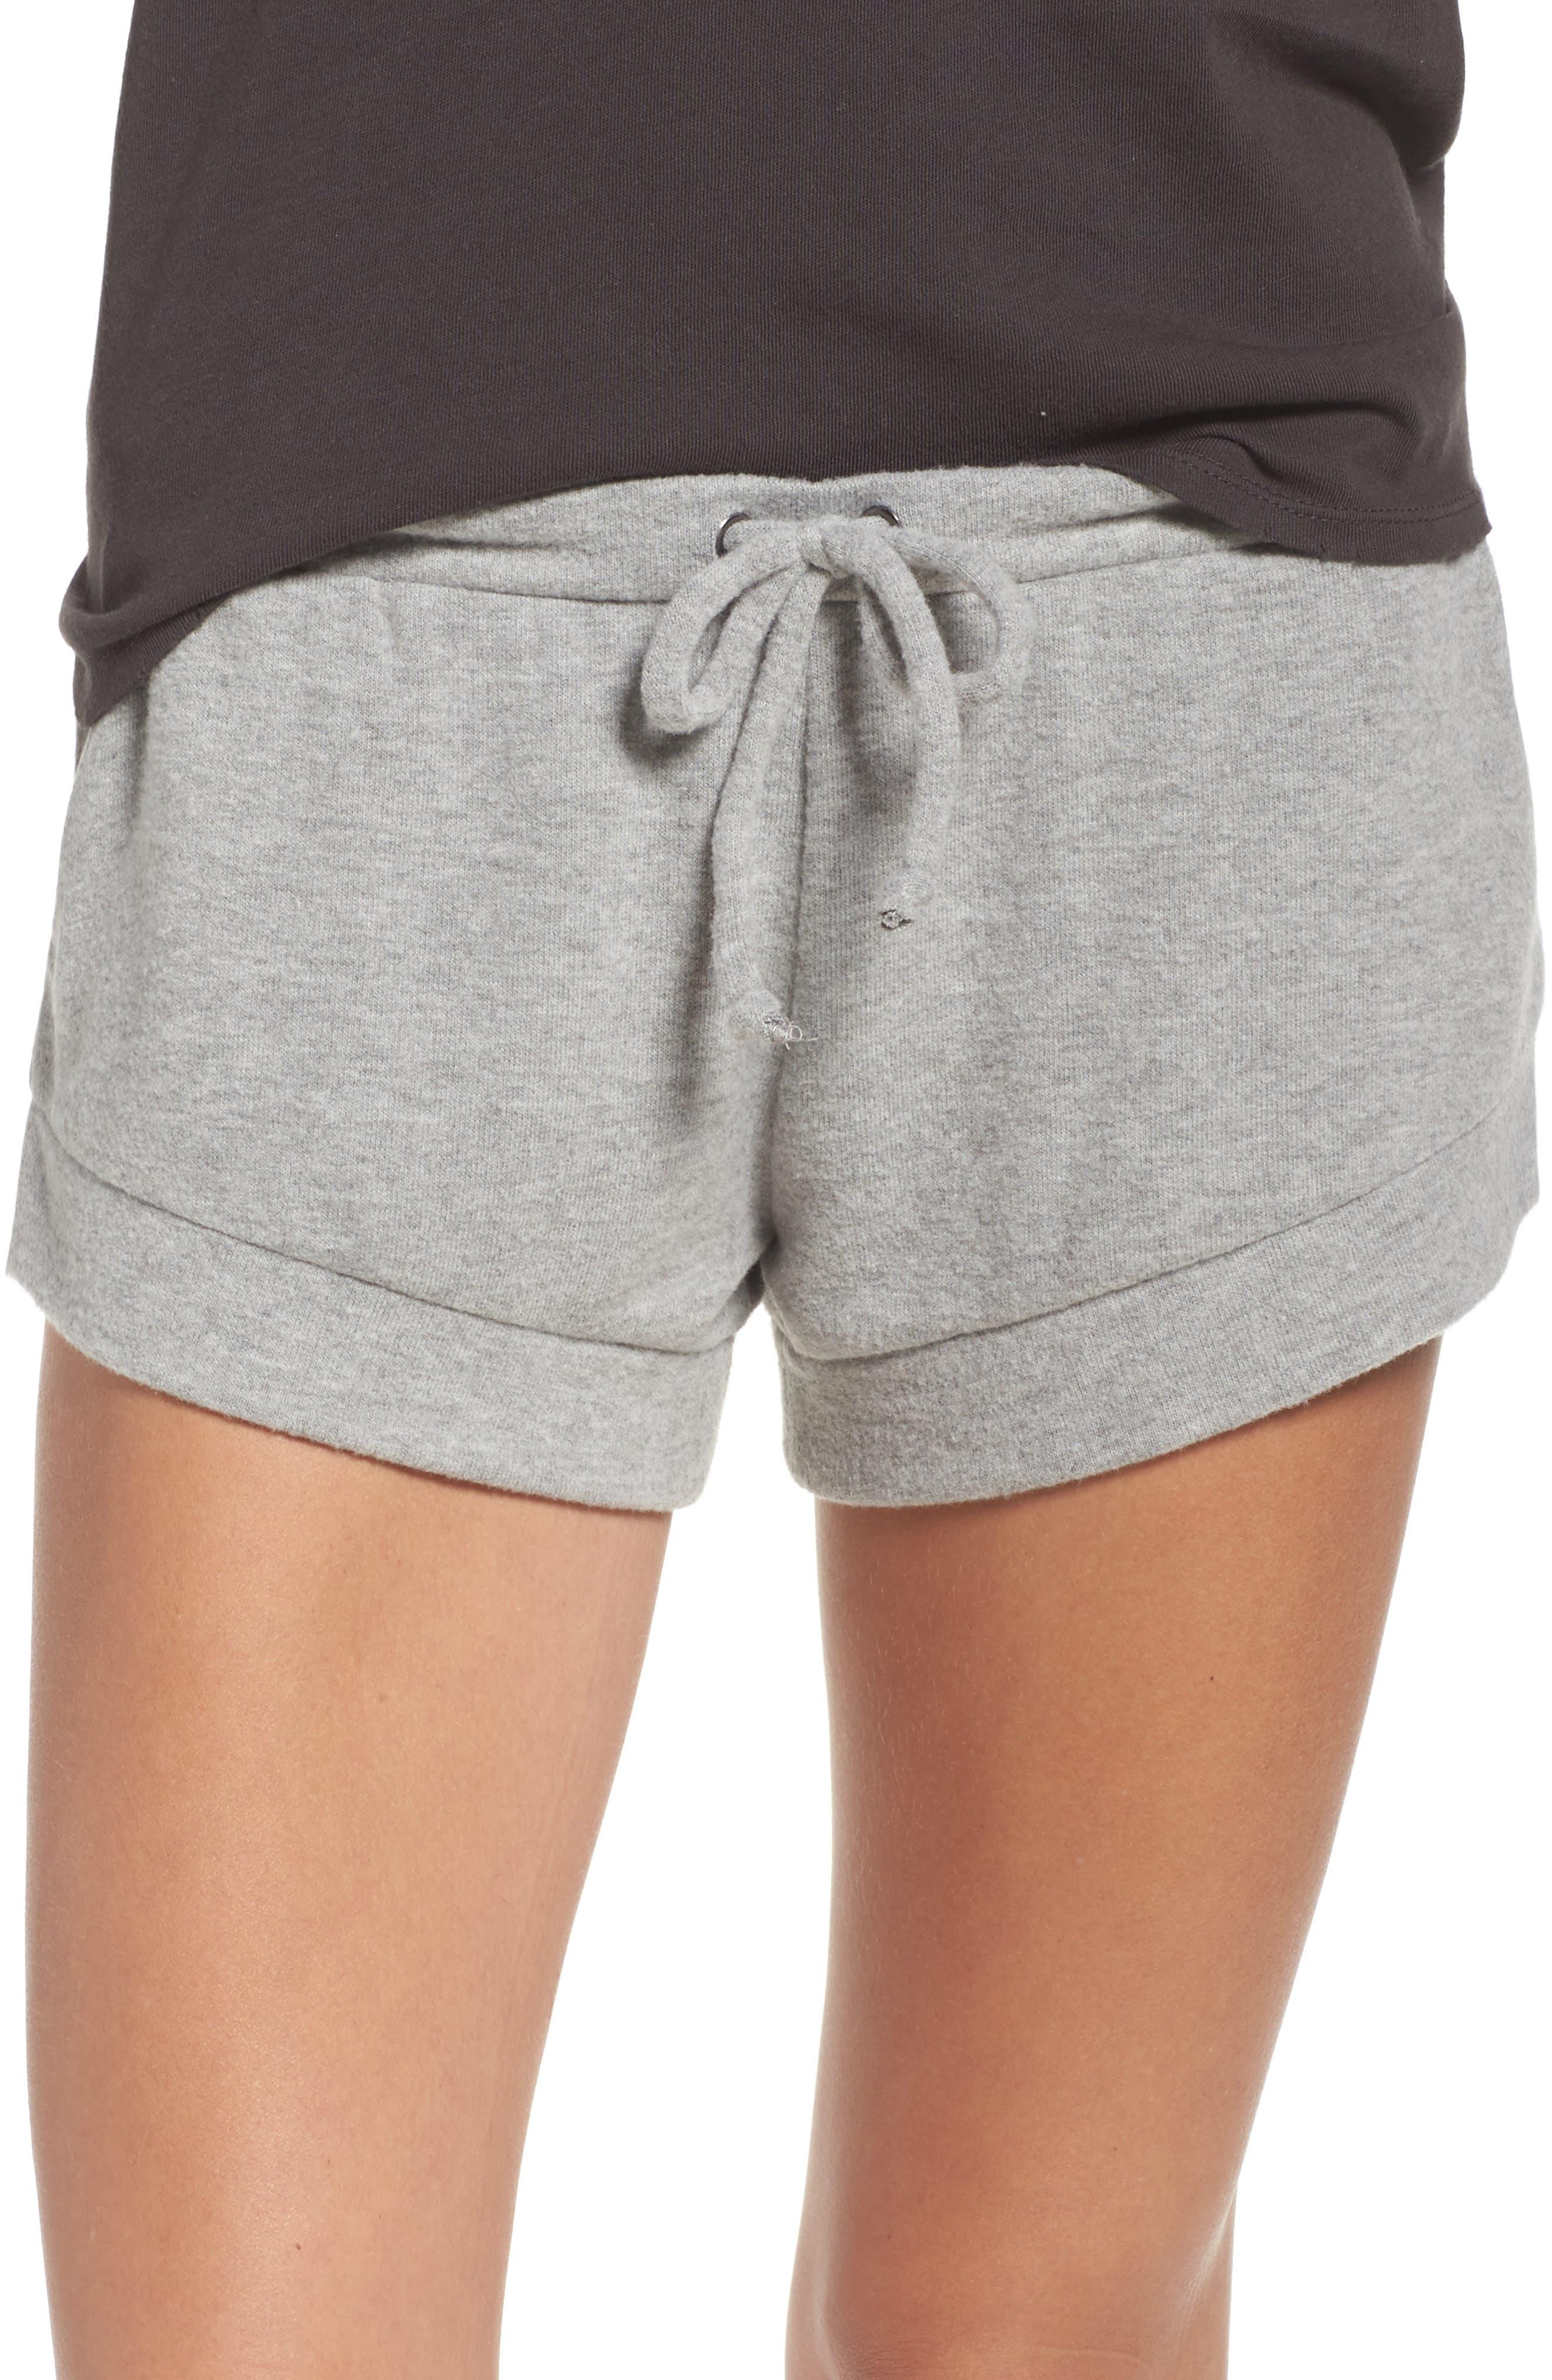 Lounge Shorts,                         Main,                         color, 039